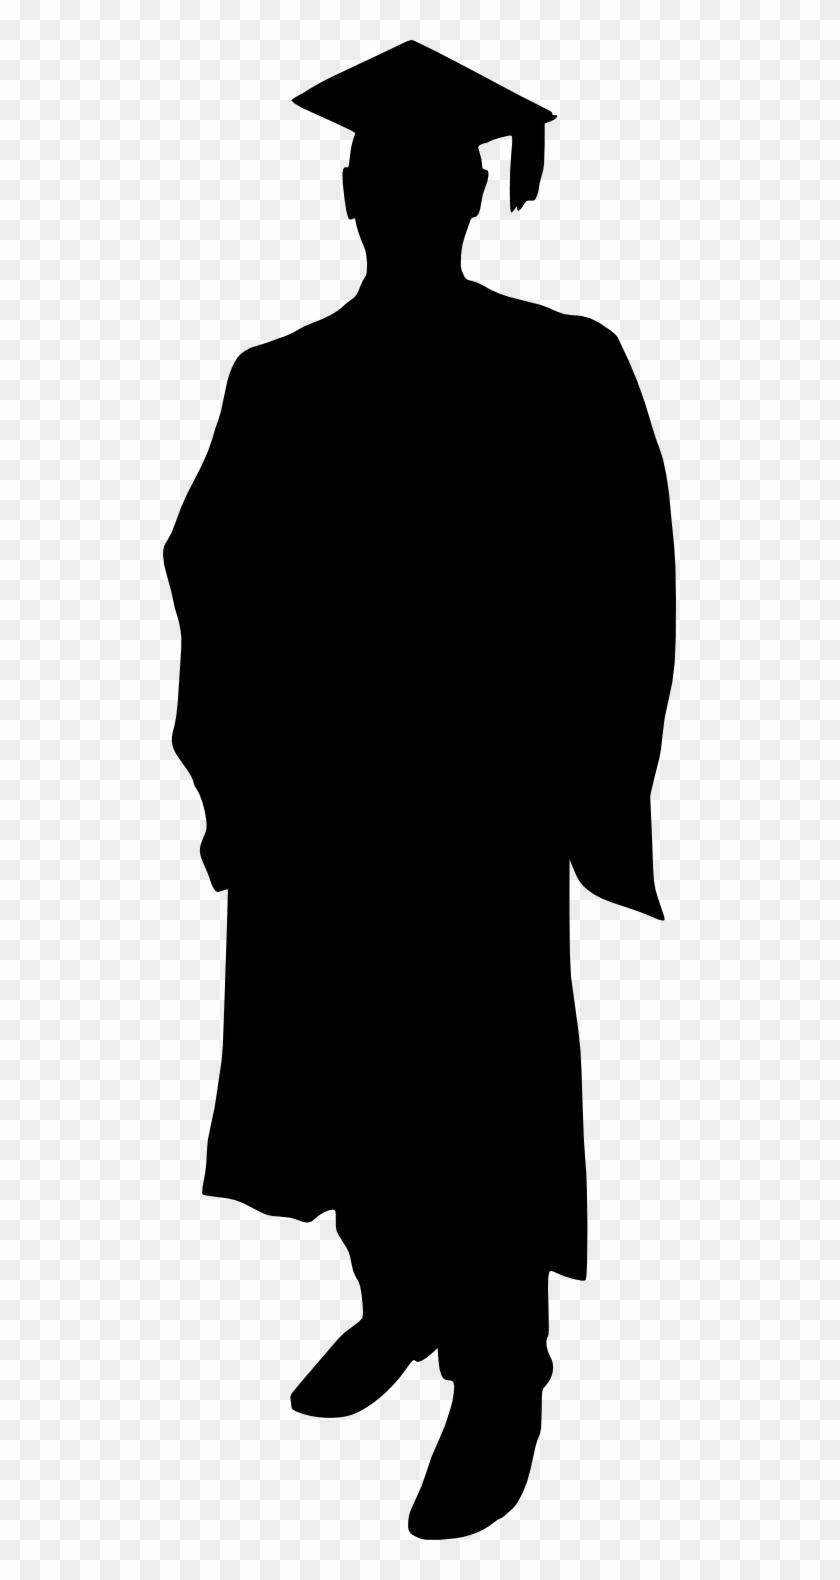 Free Download Gambar Wisuda Kartun Hitam Putih Clipart